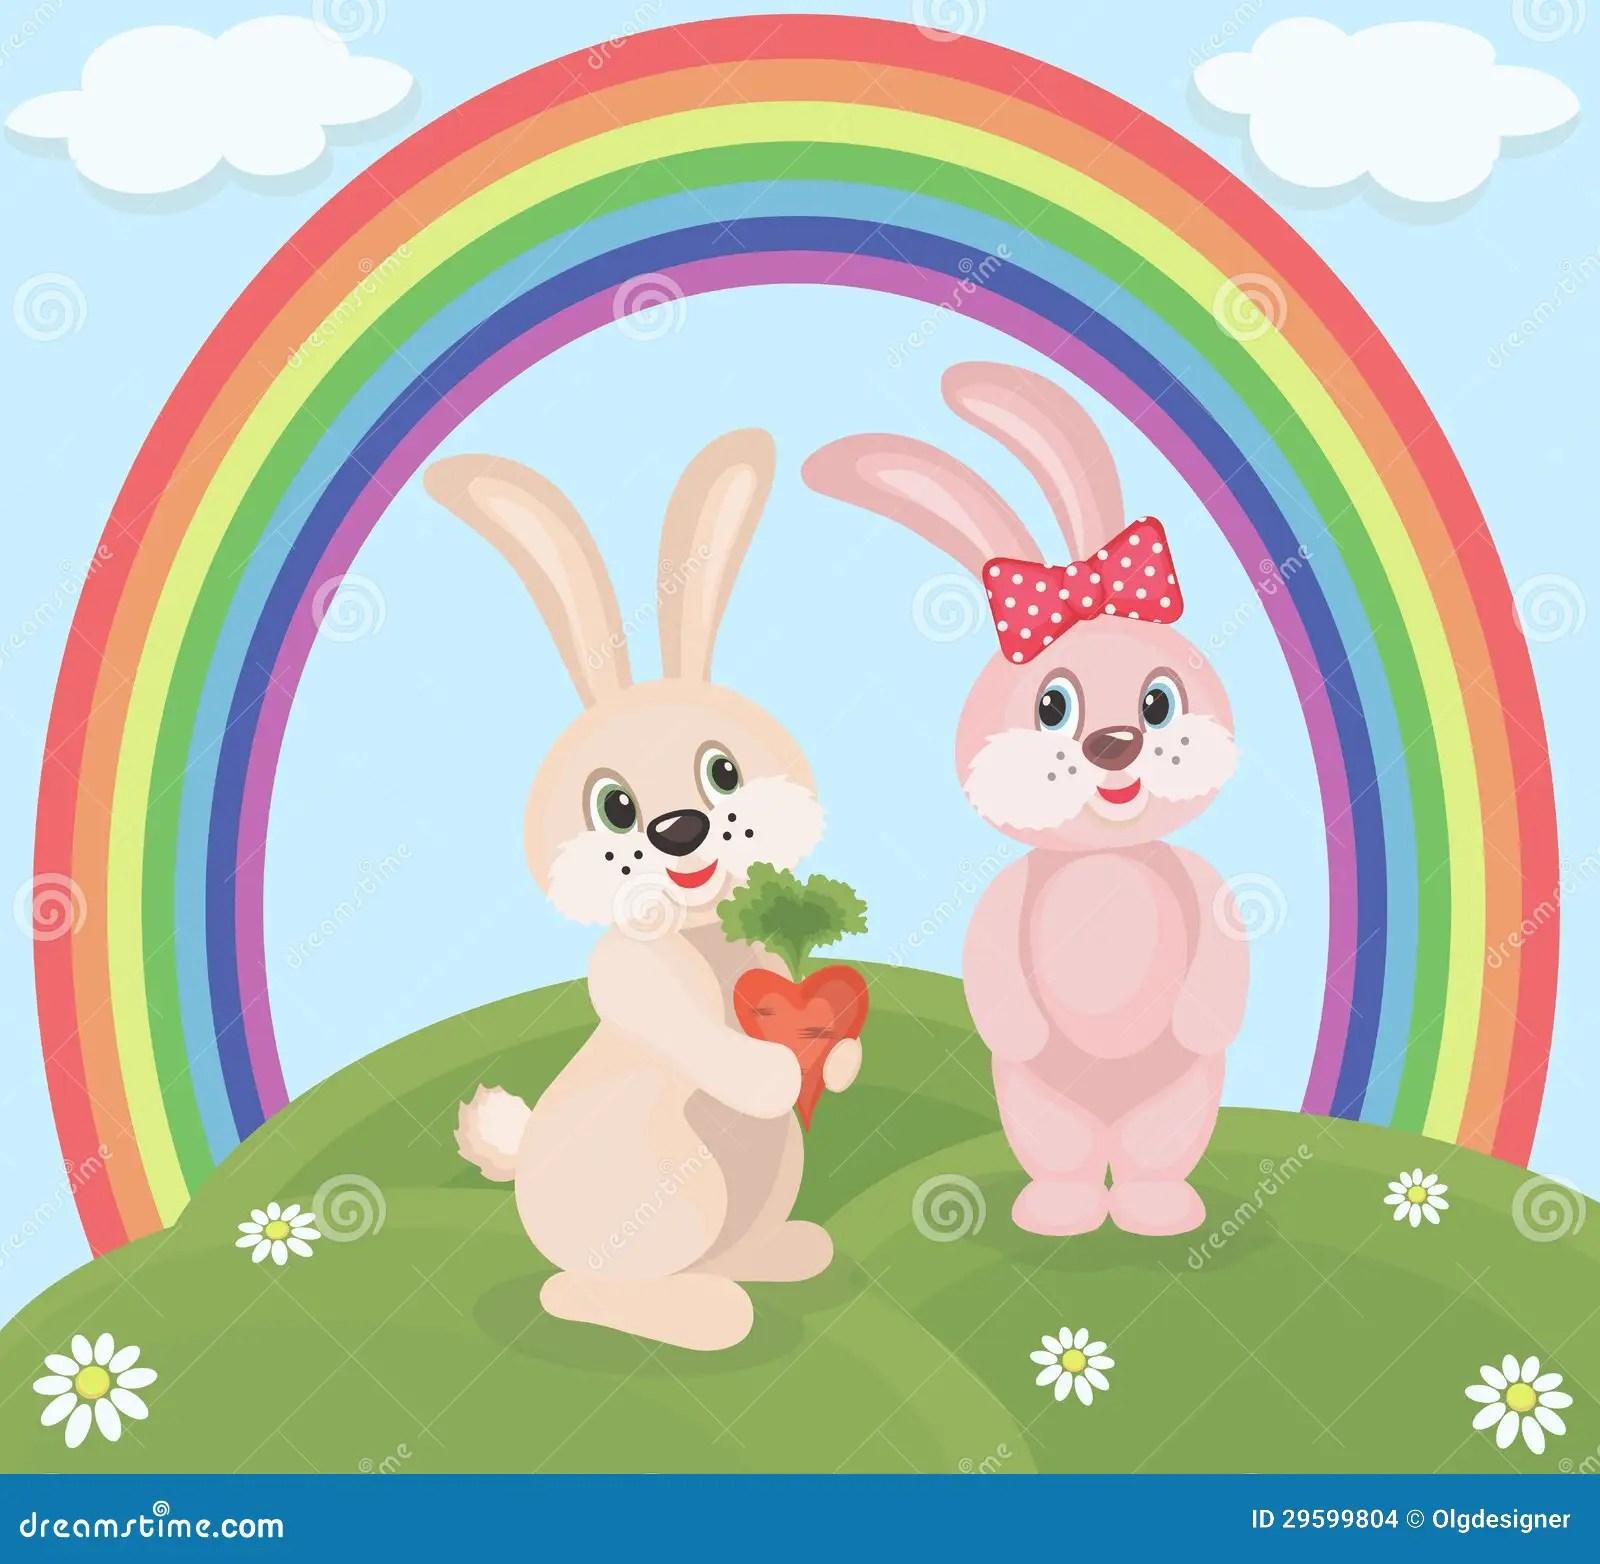 Animated Happy Birthday Wallpaper Free Download Cartoon Rabbits Stock Vector Image Of Delicacy Children